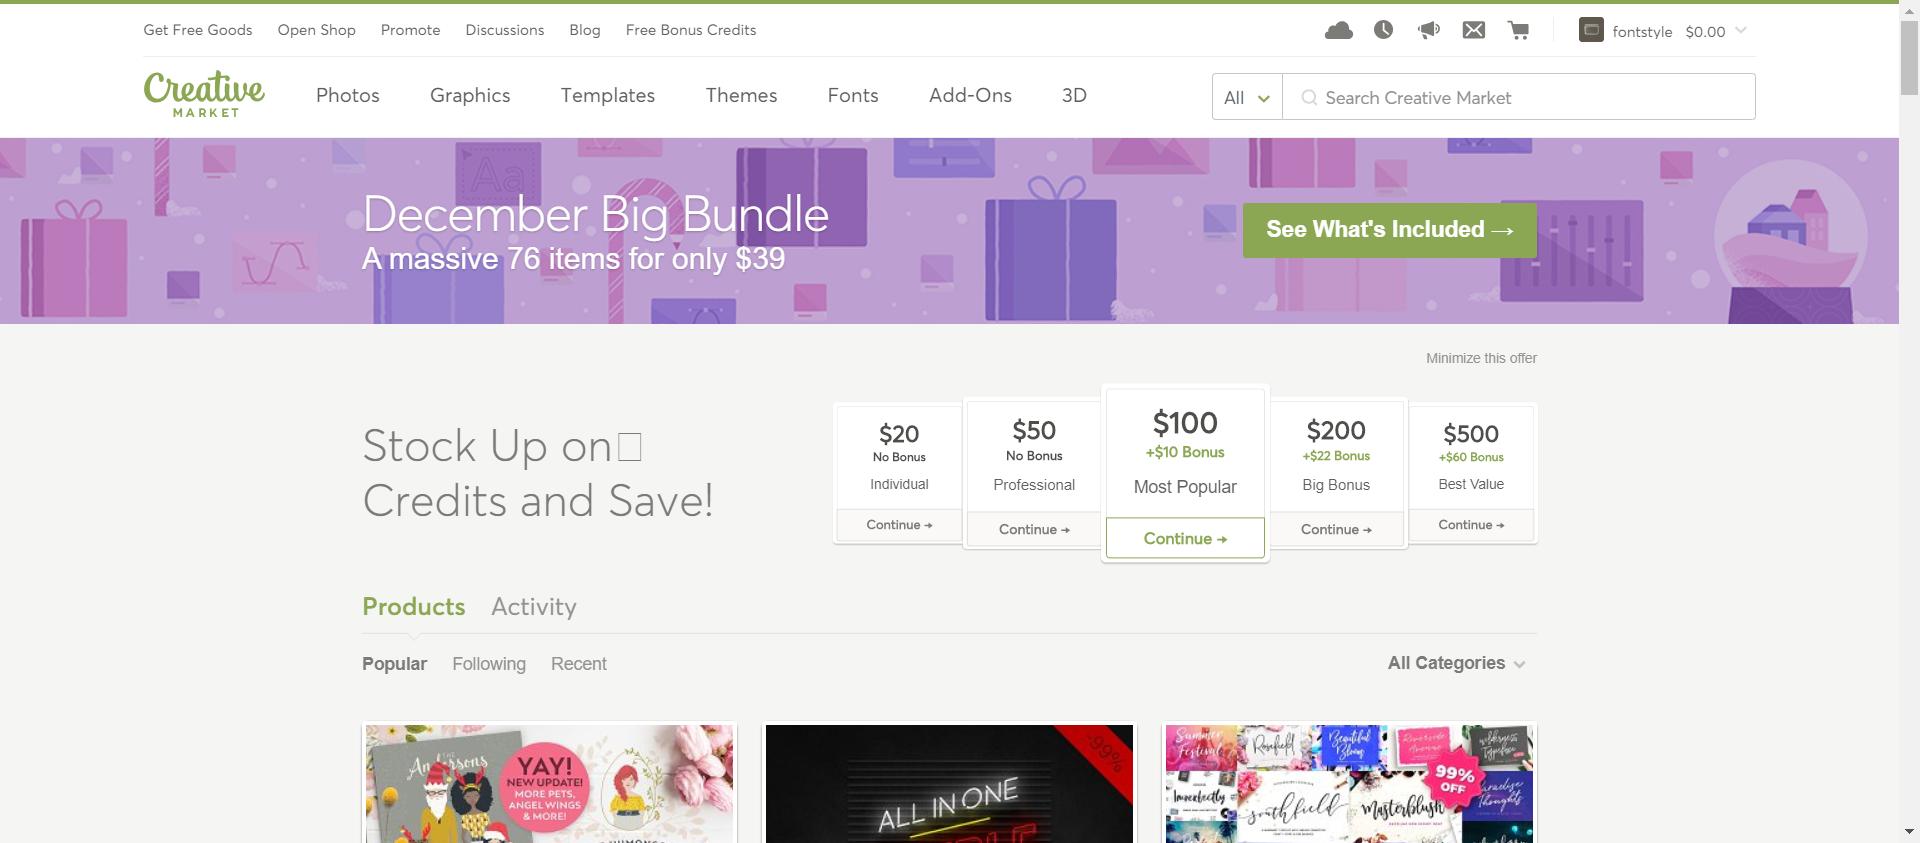 Creative Market website image